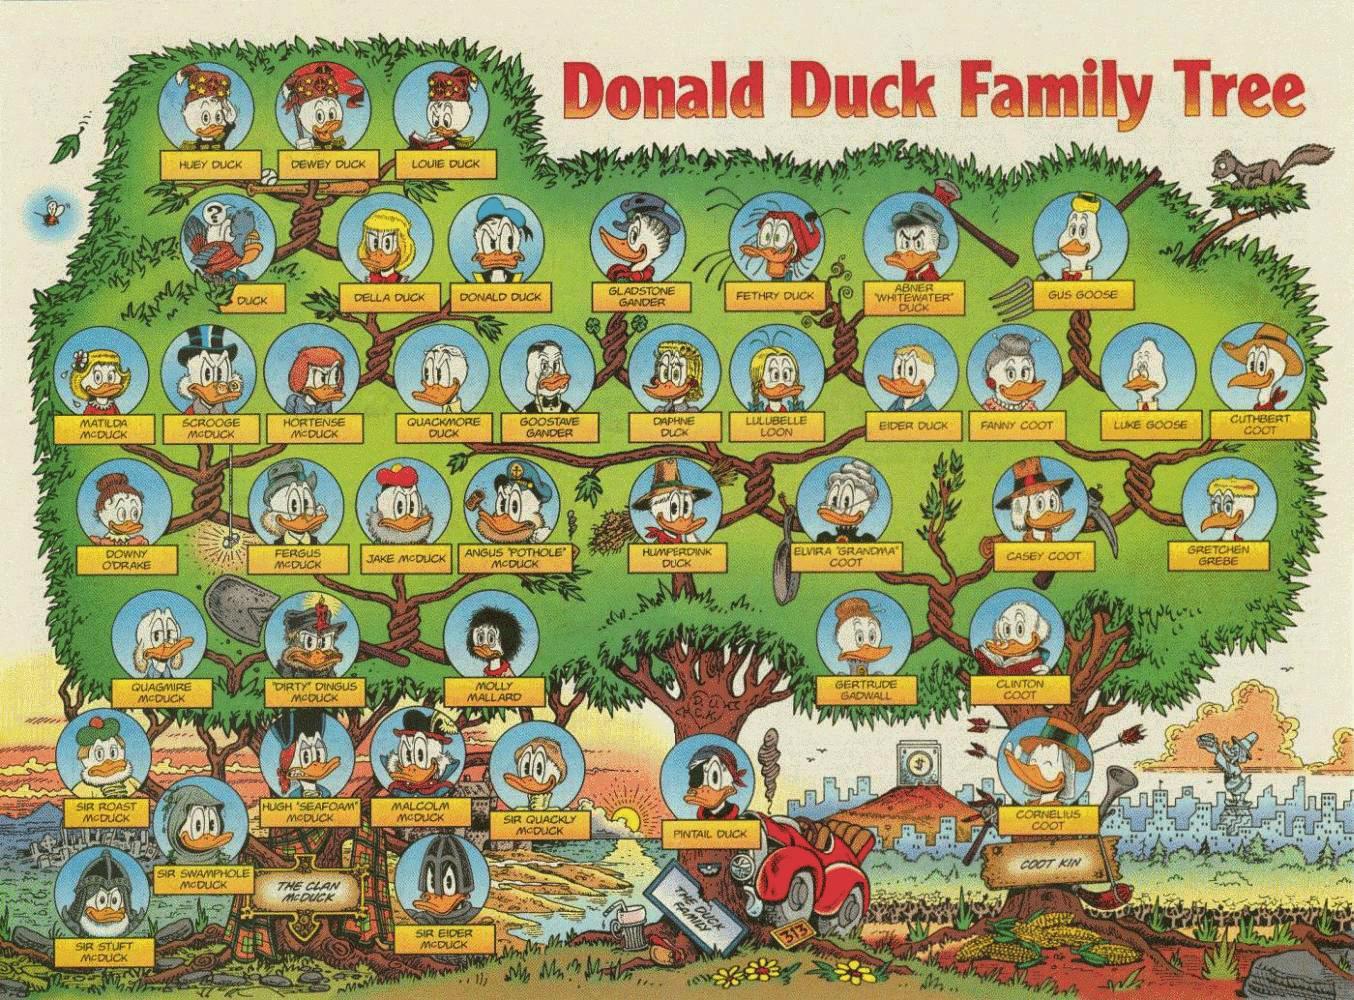 http://1.bp.blogspot.com/-RXCDKd6PhDE/Tl06WHDcxbI/AAAAAAAAAeg/xjR6wepJ2QY/s1600/Donald+Duck+family+tree.jpg